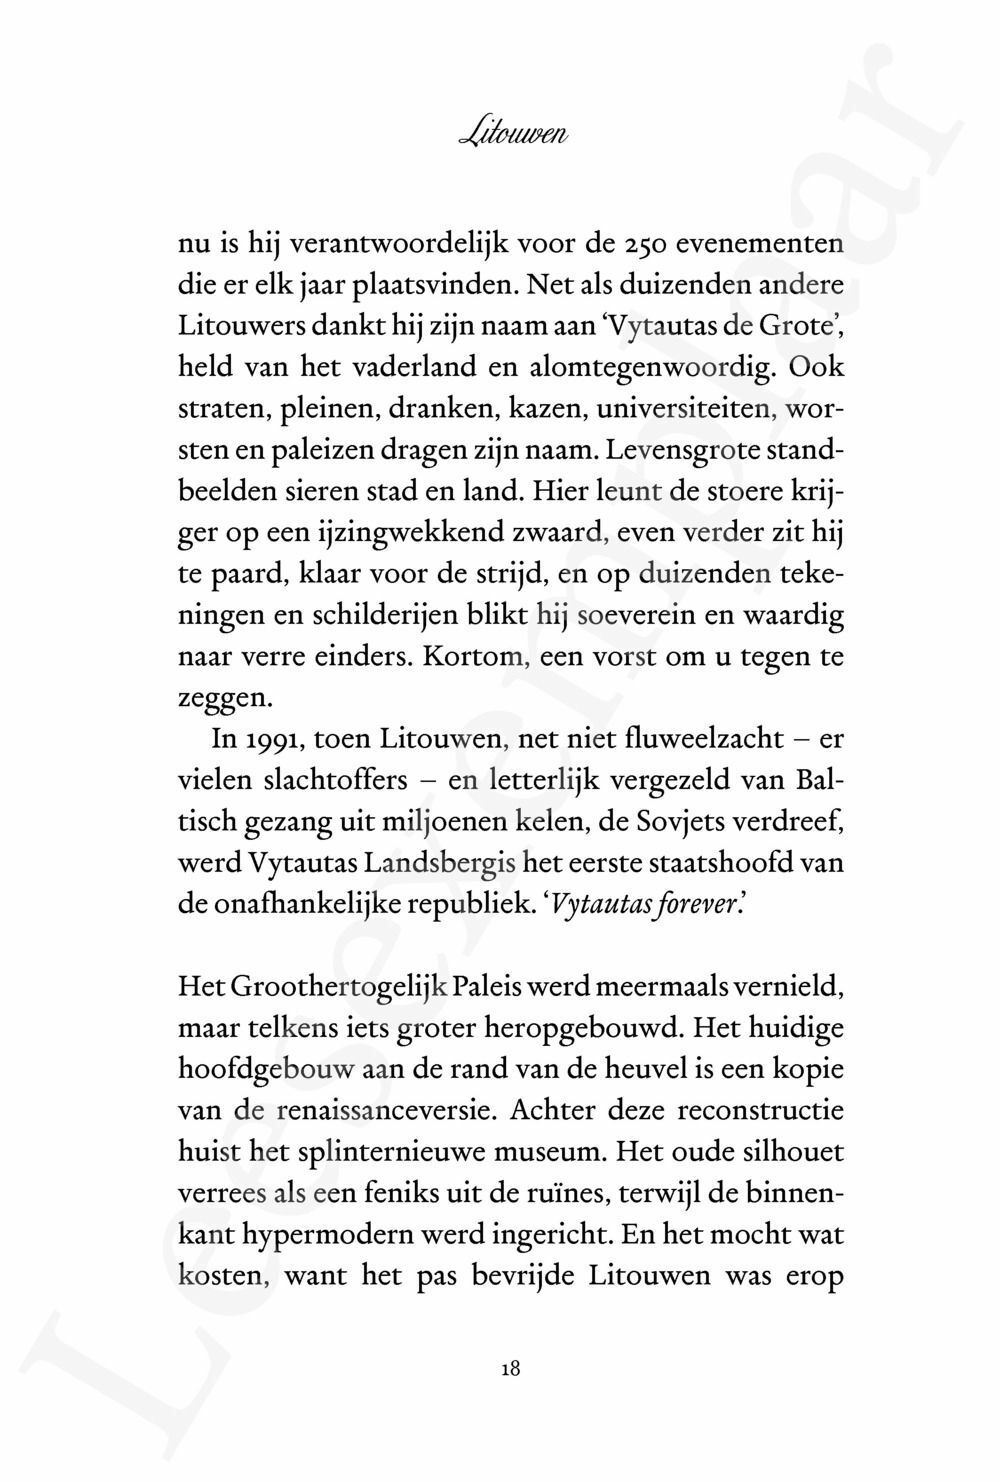 Preview: Litouwen